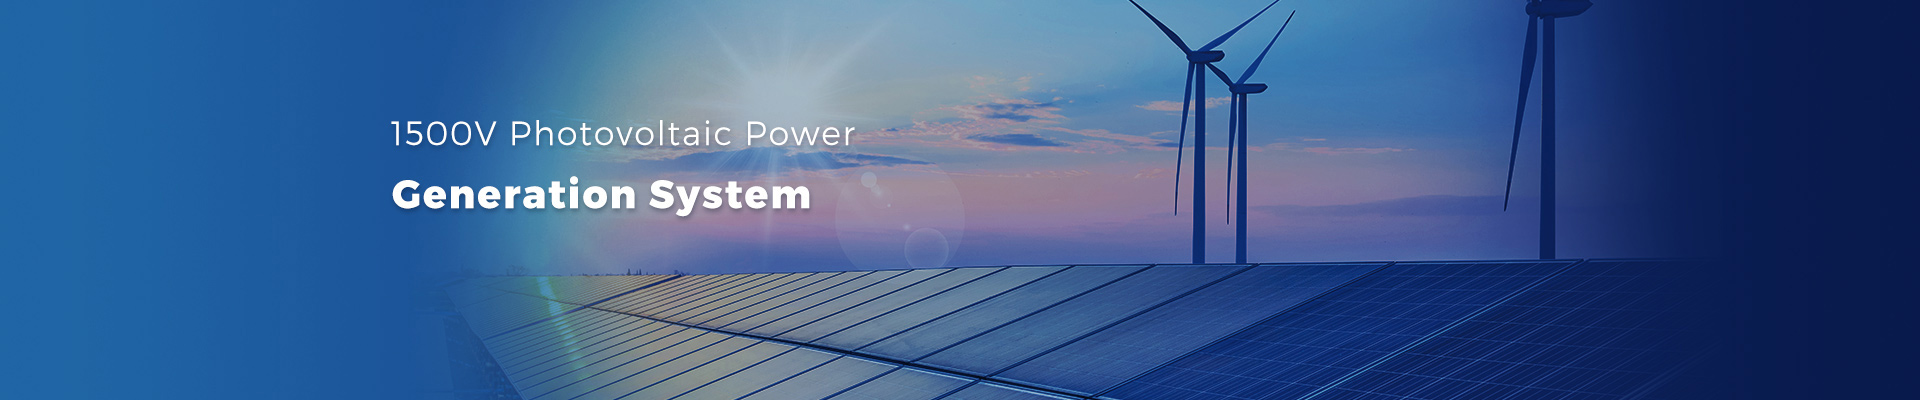 1500V Photovoltaic Power Generation System